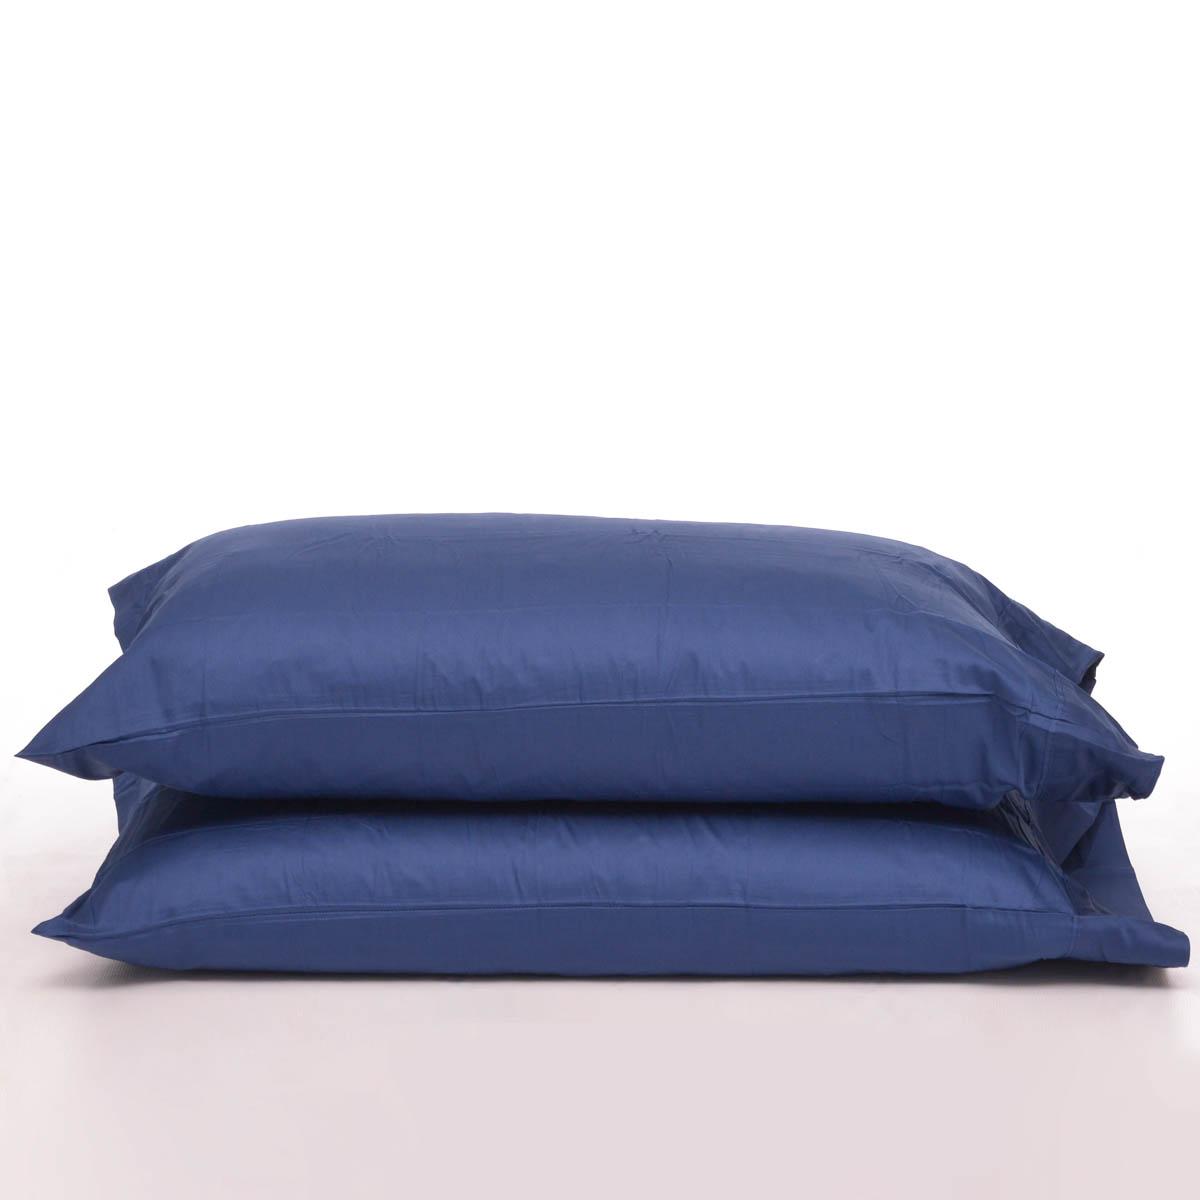 Funda para Almohada K Basic 300 Pipping Tw Blue